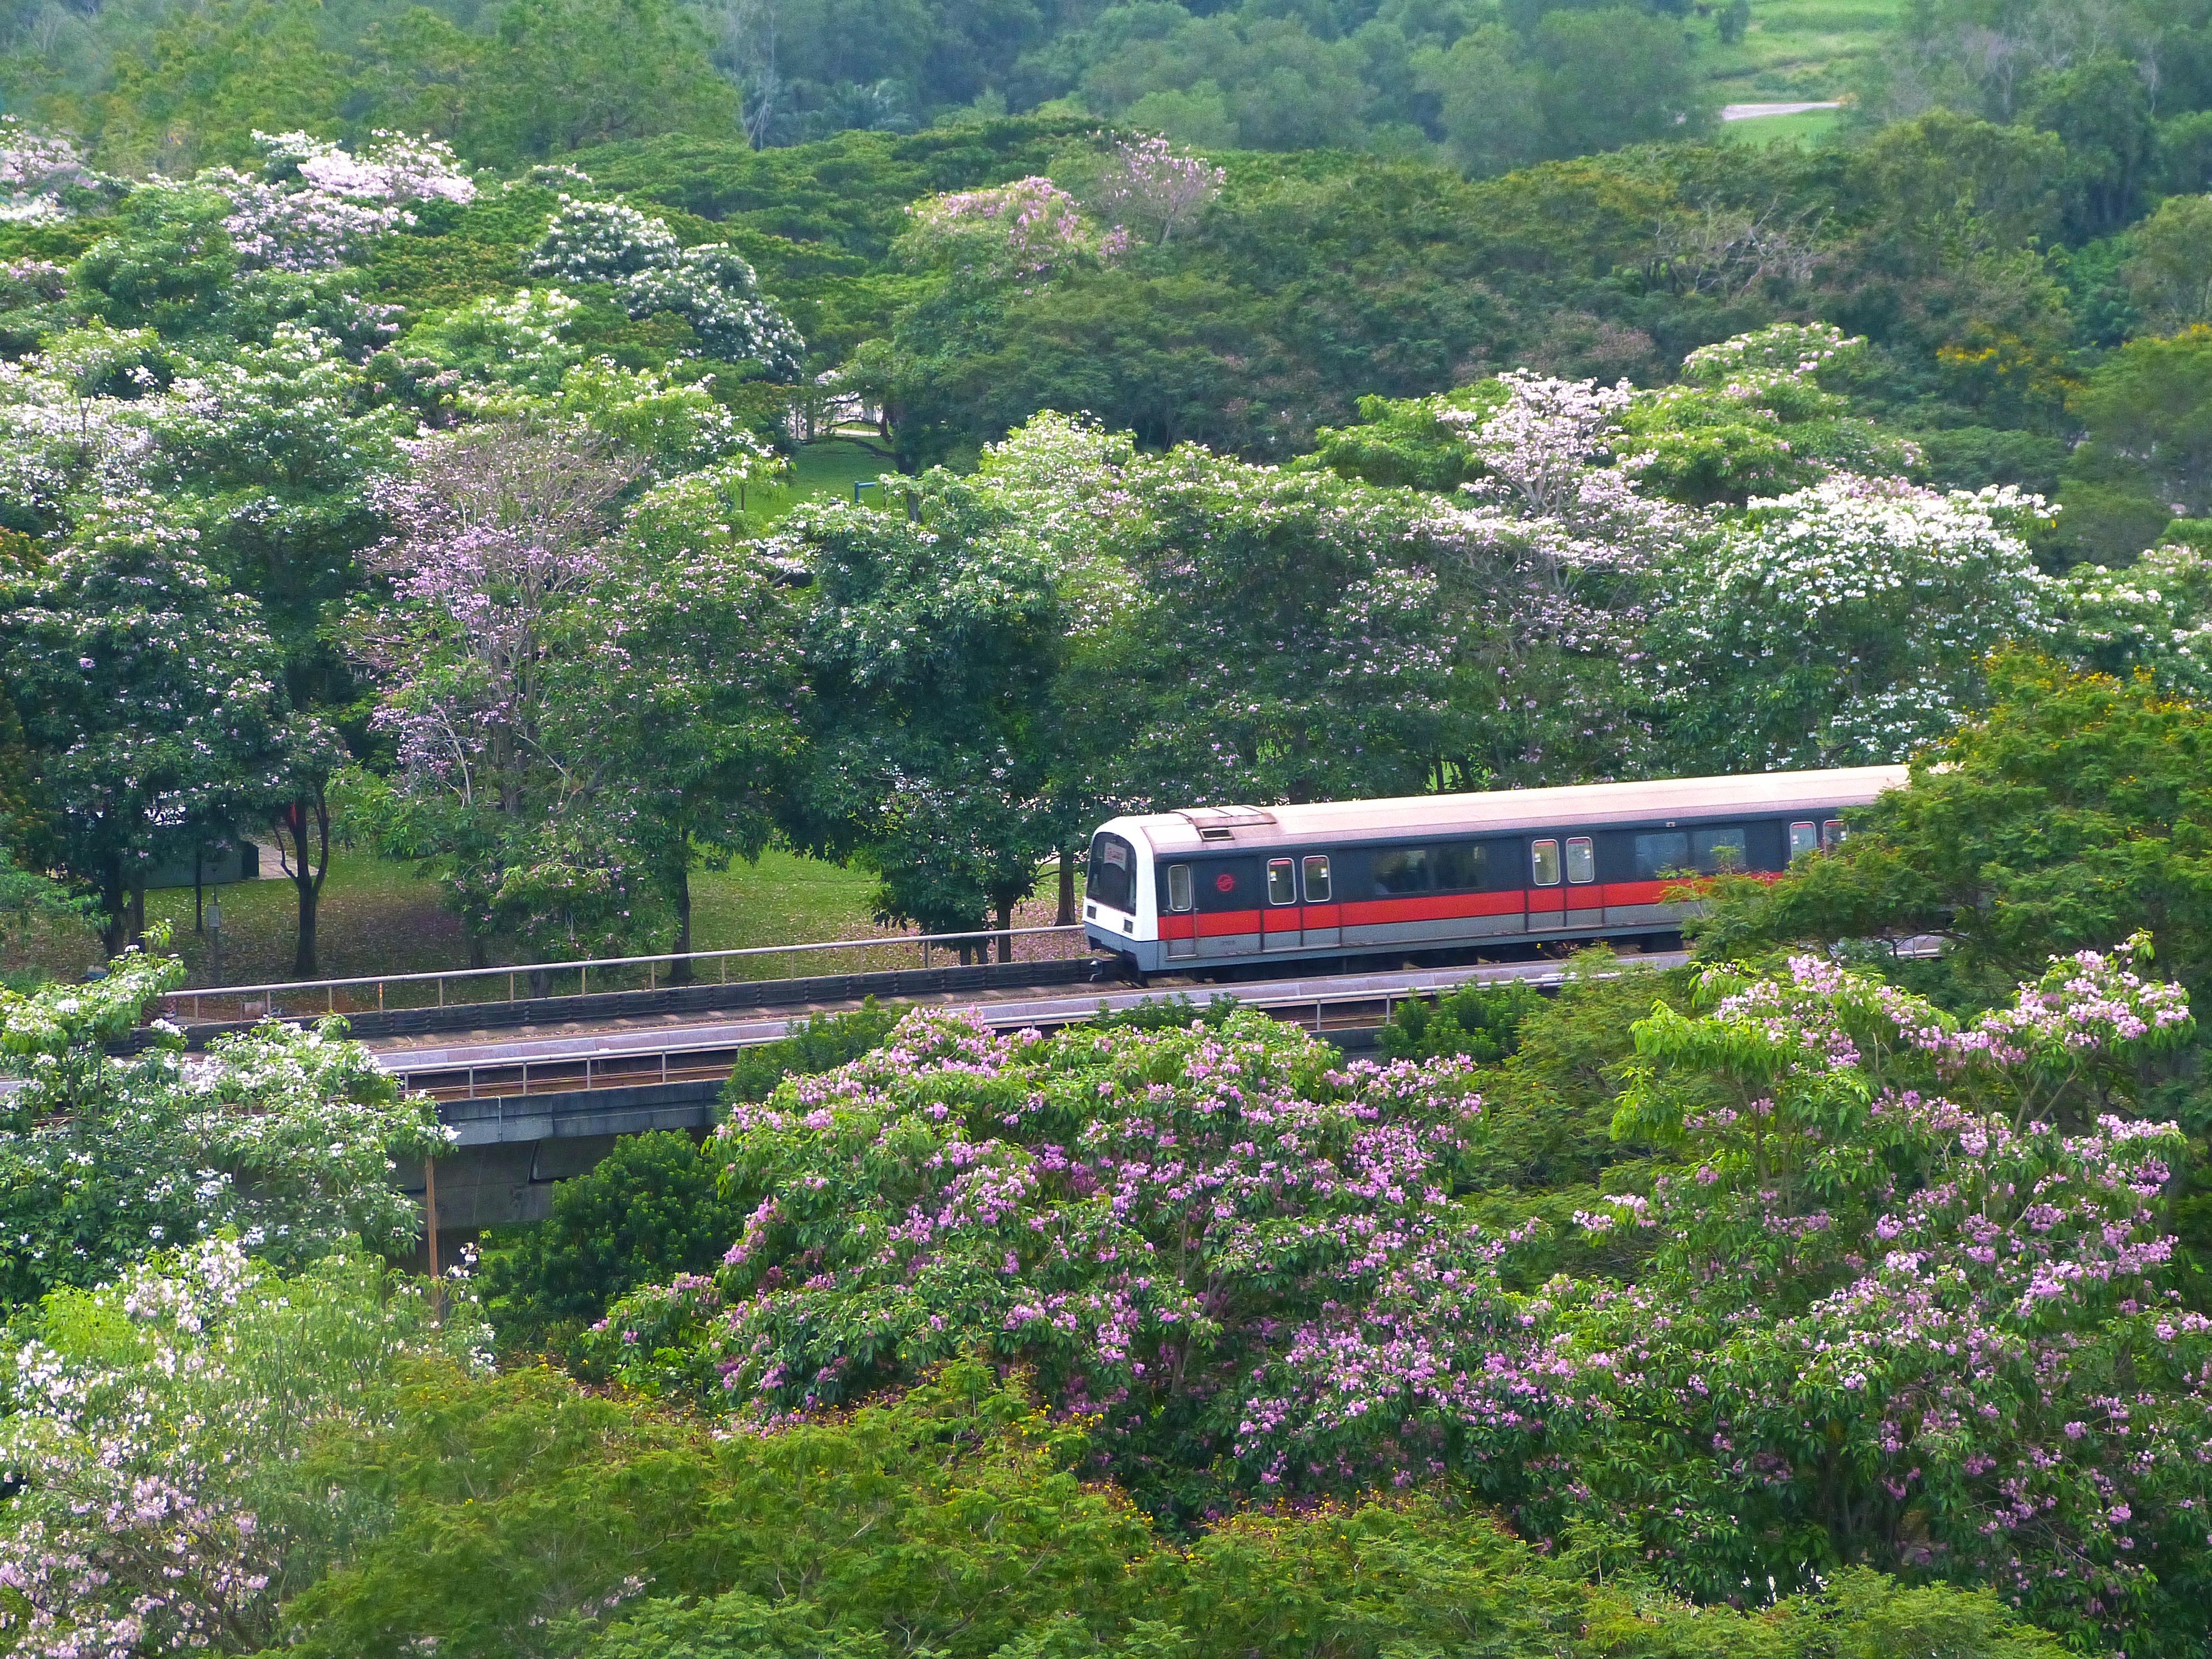 landscape nature track flower train river transport green vehicle park blooming garden pink public transport flowers